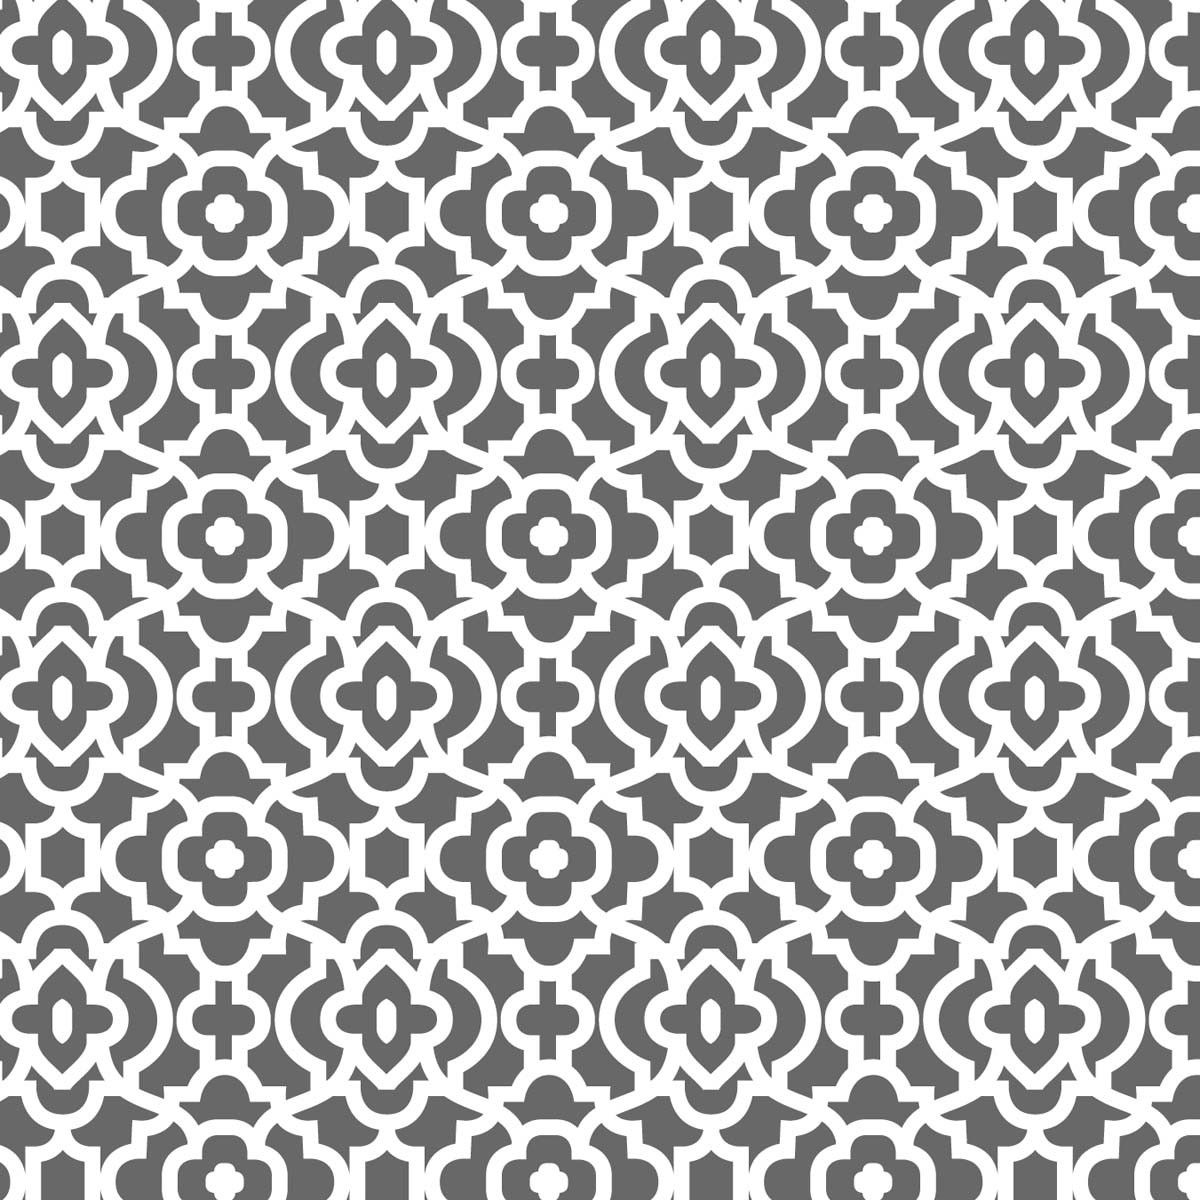 Baroque antipill fleece fabric fleece fabric for blankets